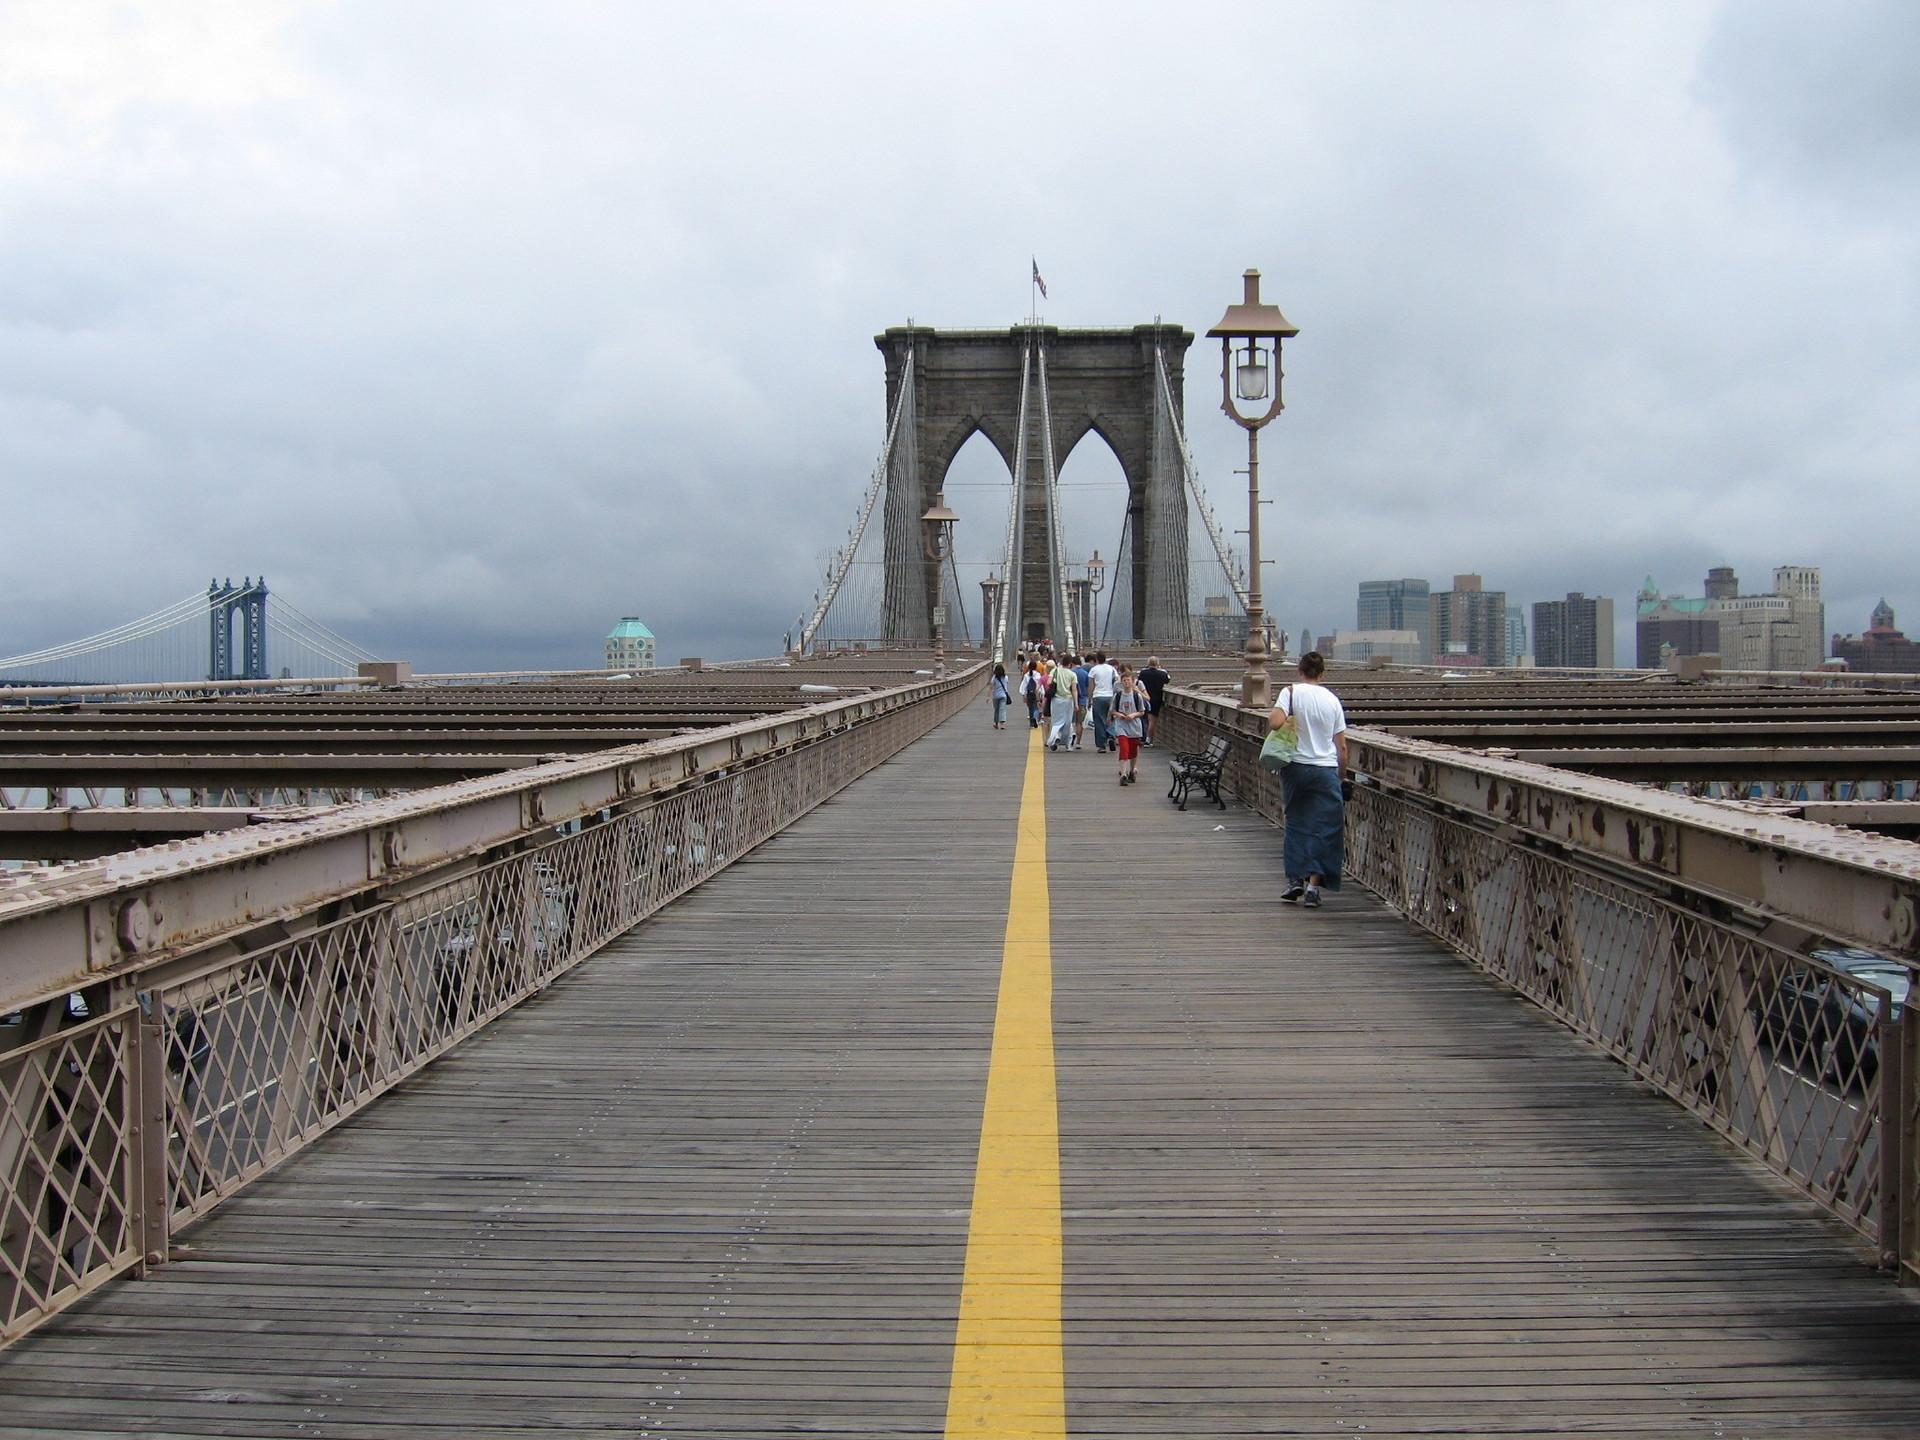 Brooklyn-Bridge-New-York-travel-1106237_1920_1440